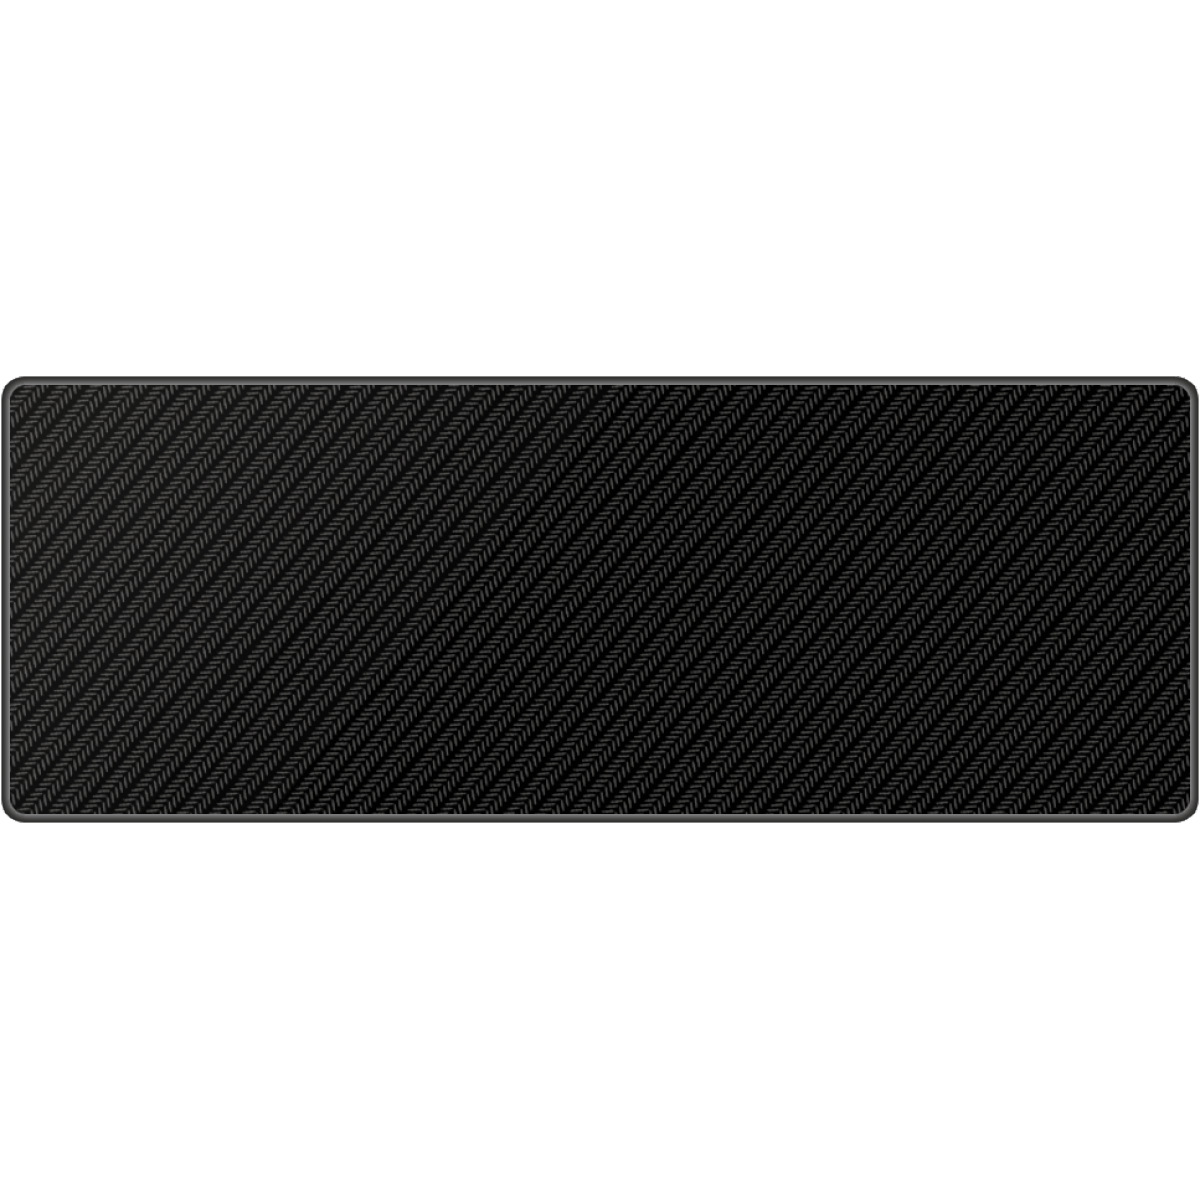 Mousepad Gamer Cougar, Arena X, Extra Large, Black, 3MARENAX.0001